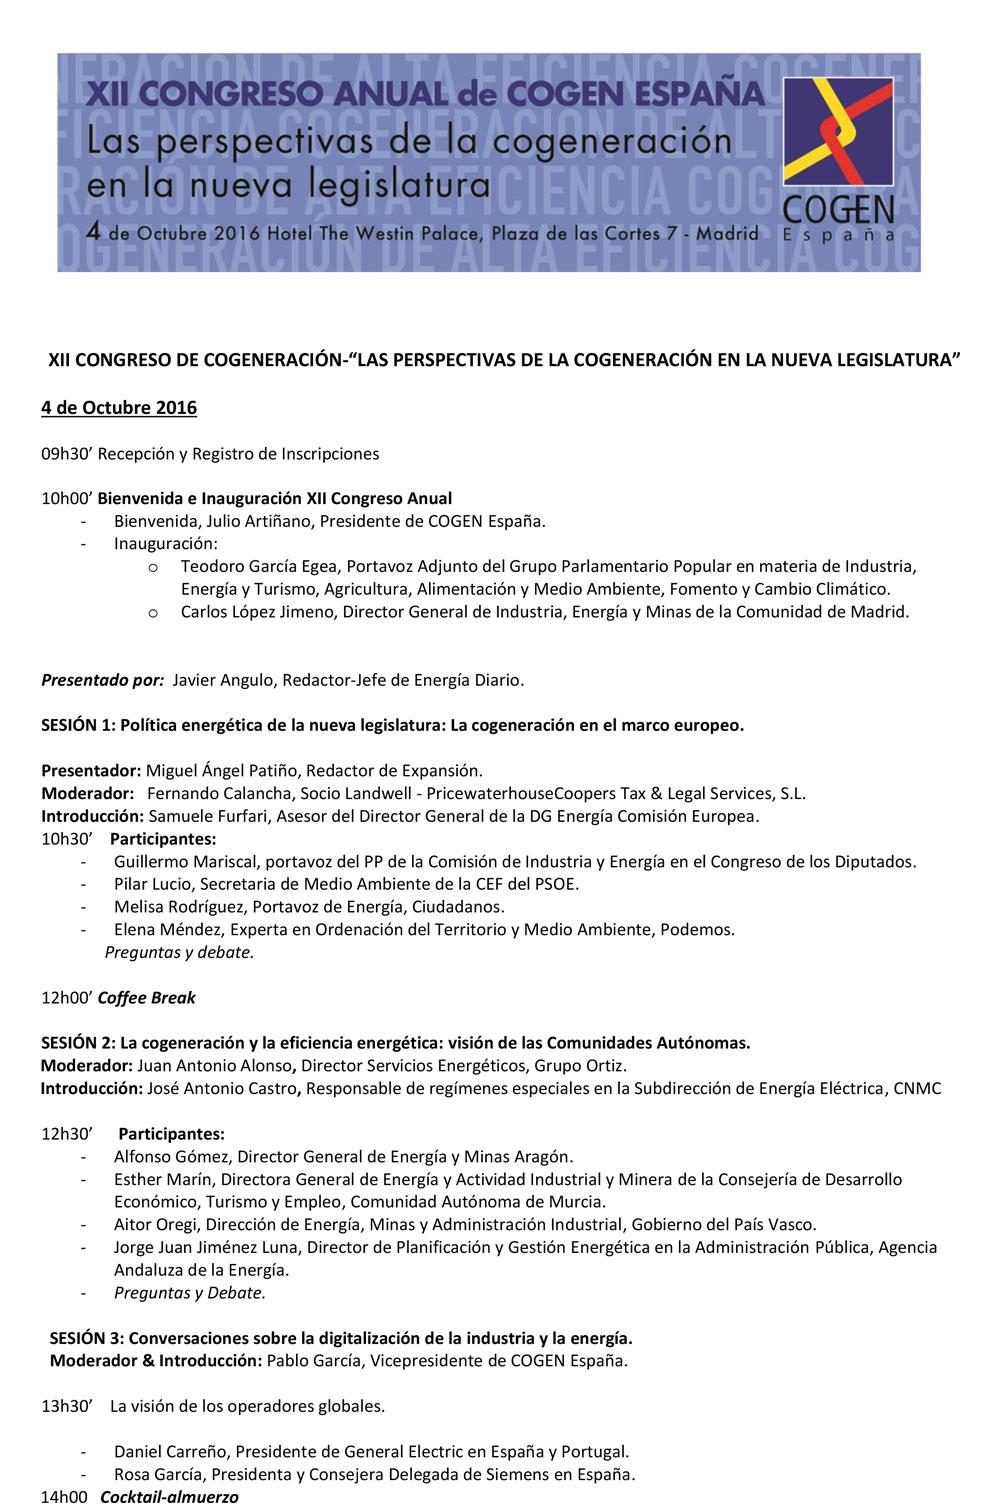 28092016-programa-xii-congreso-anual-de-cogen-espana-v42-def-1